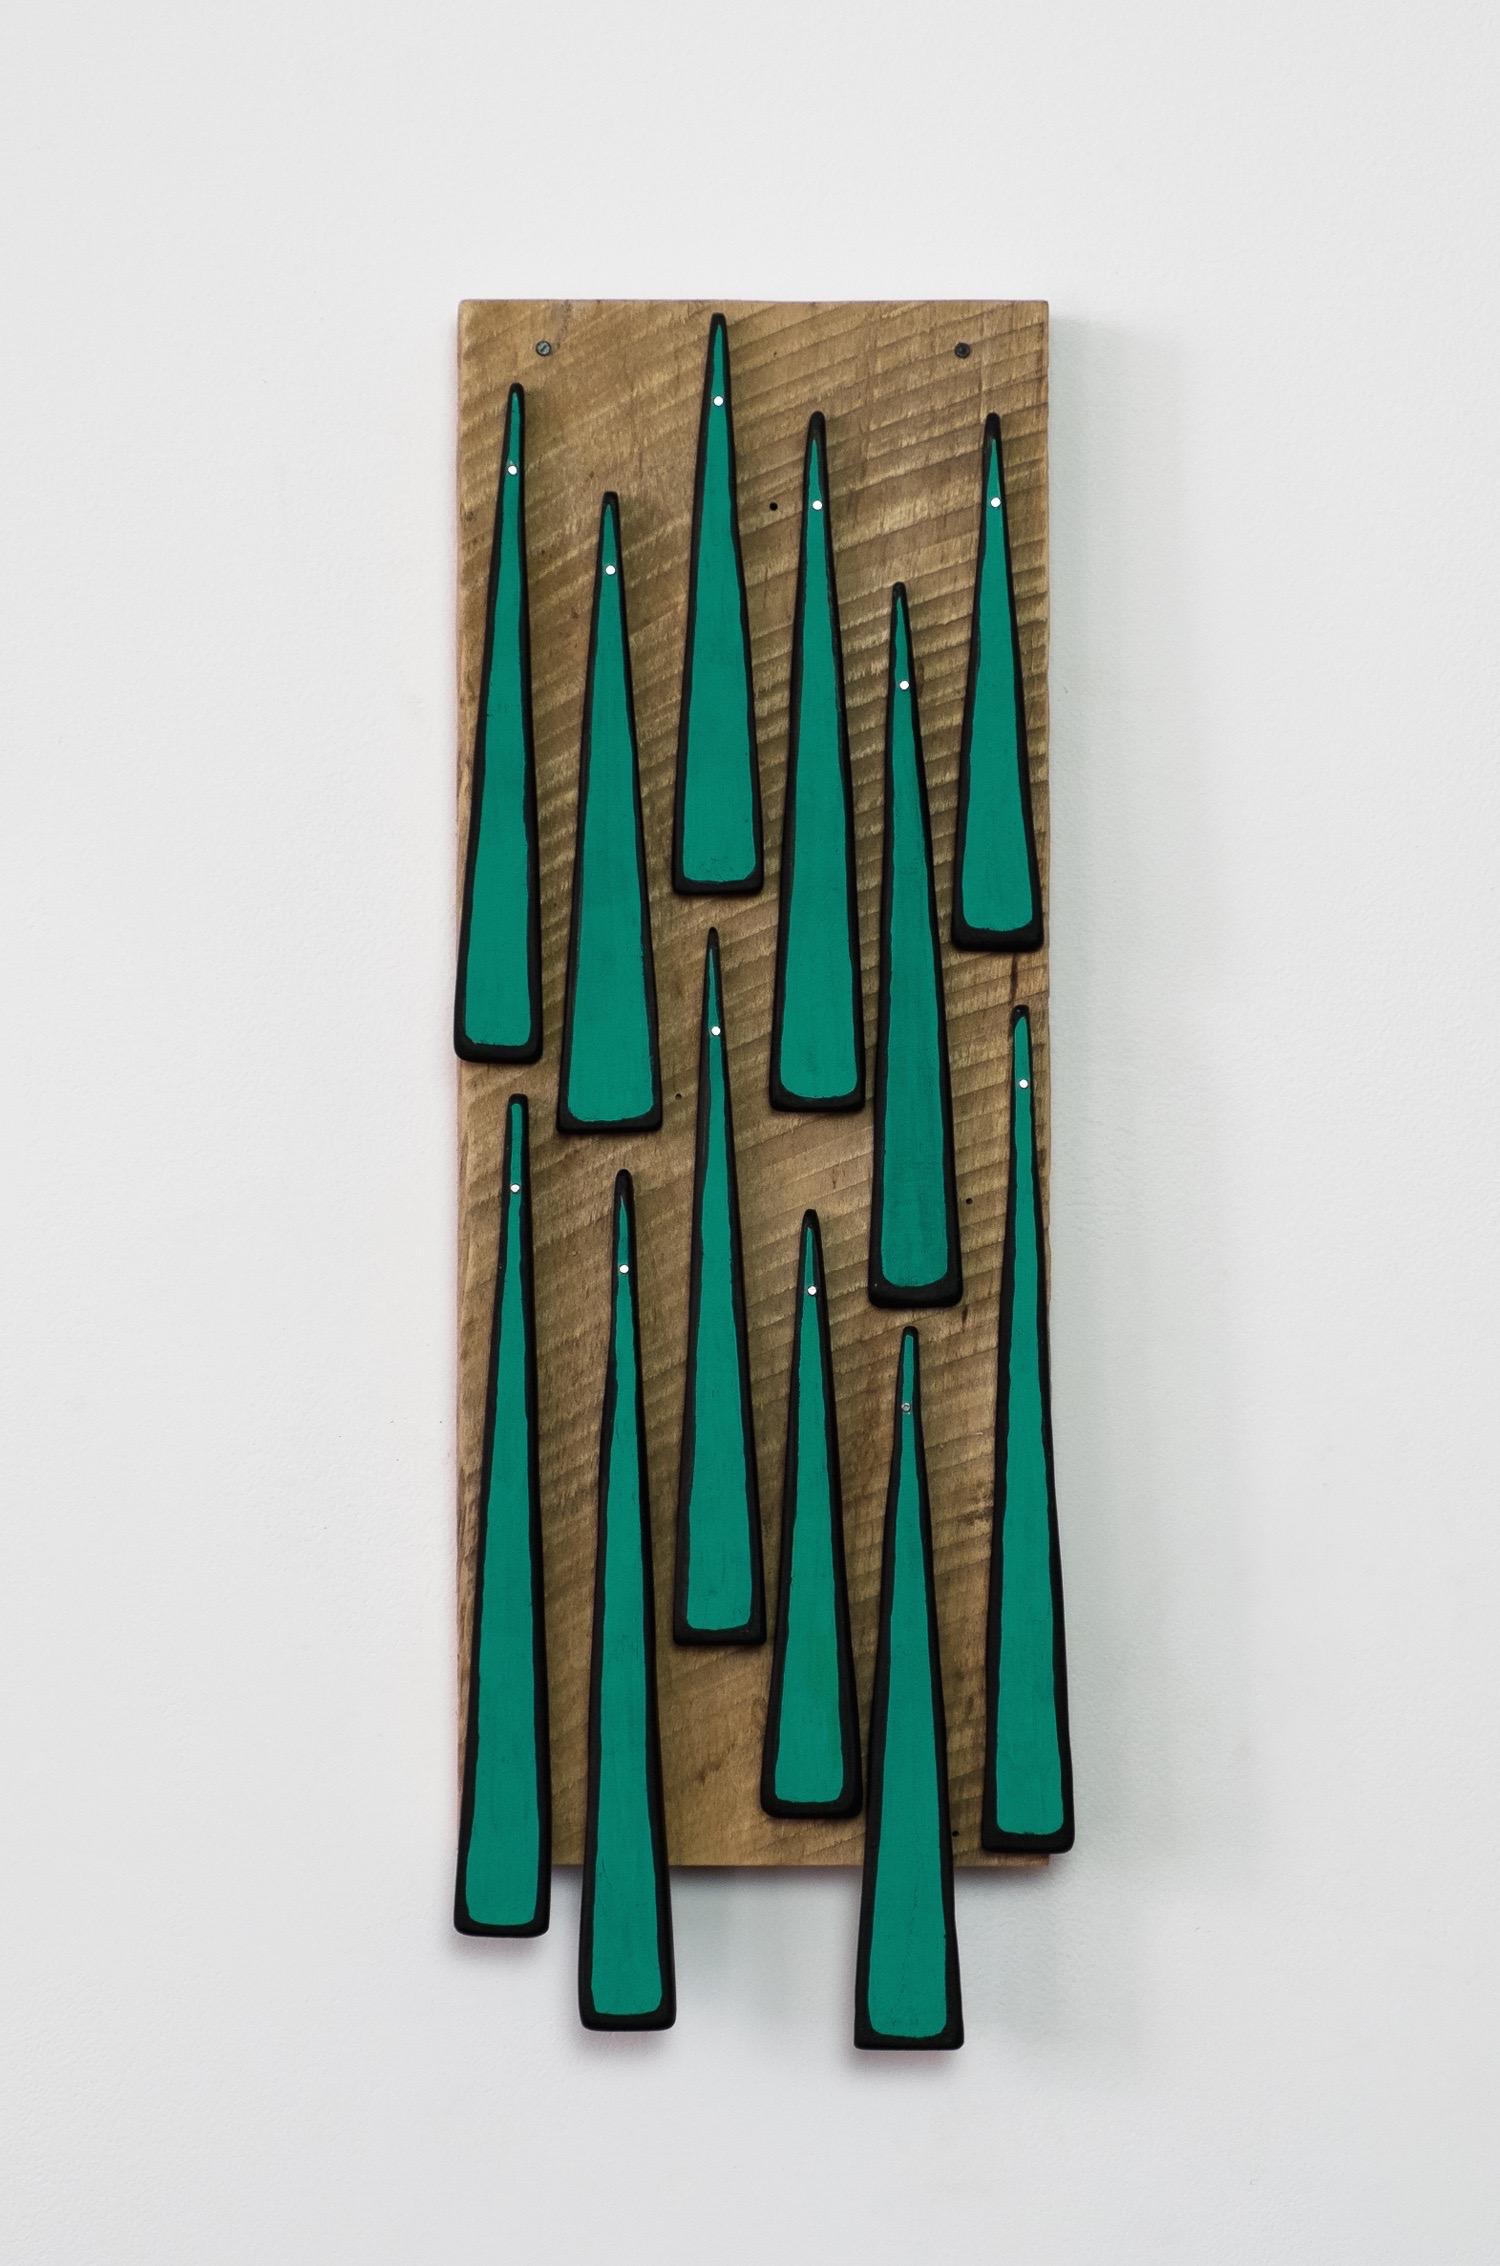 "Untitled, 2013, wood, paint, nails, 5 ¾ x 1 ¾ x 17"""